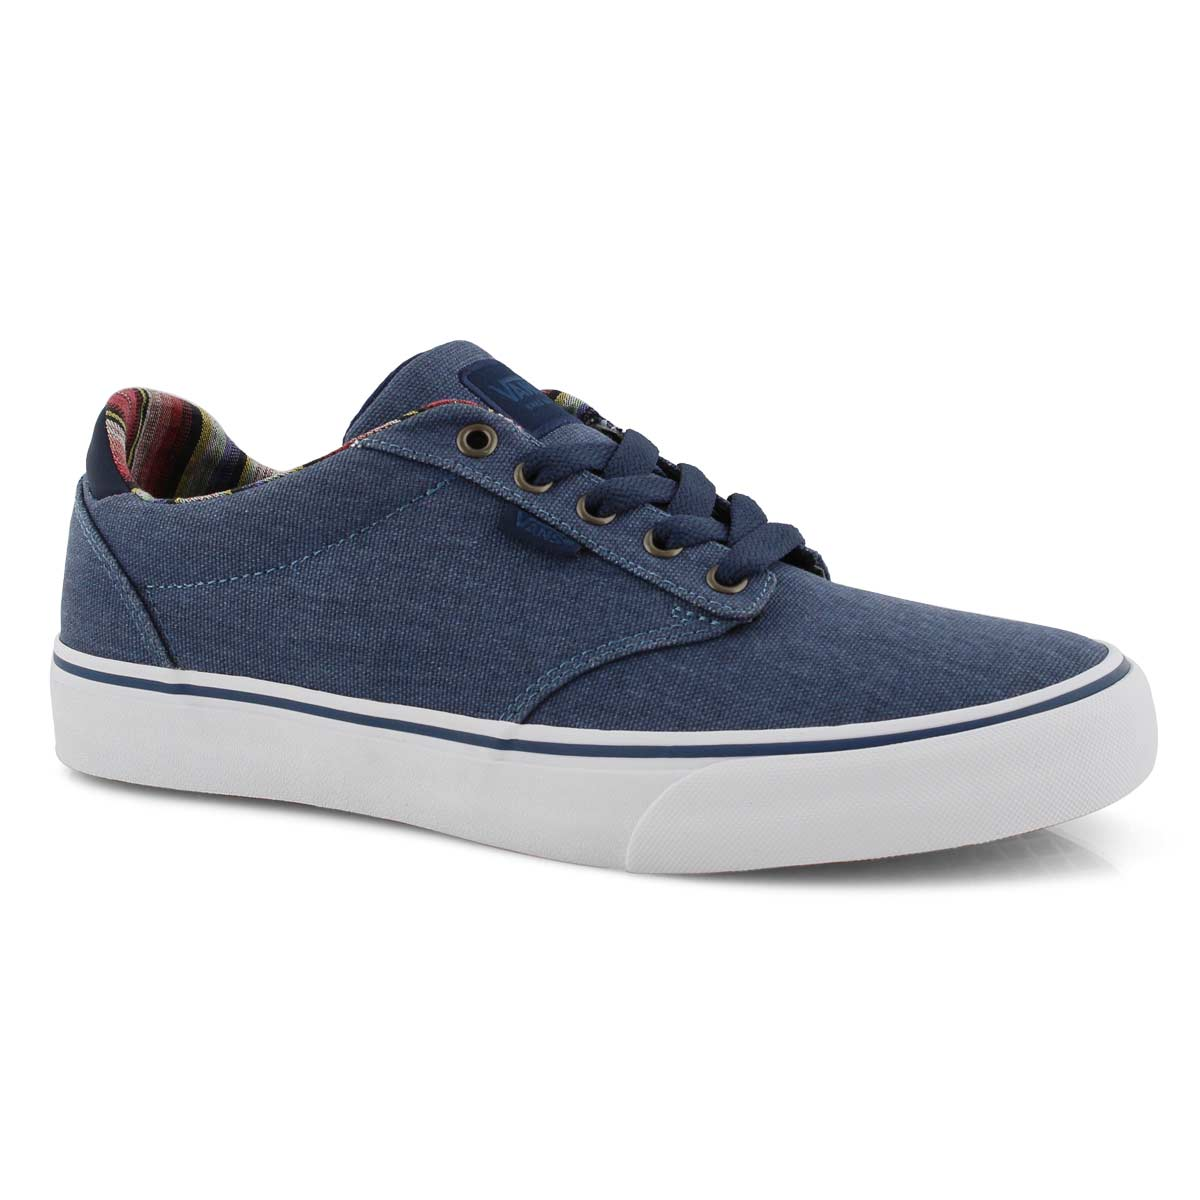 Men's ATWOOD DELUXE blue/white sneaker